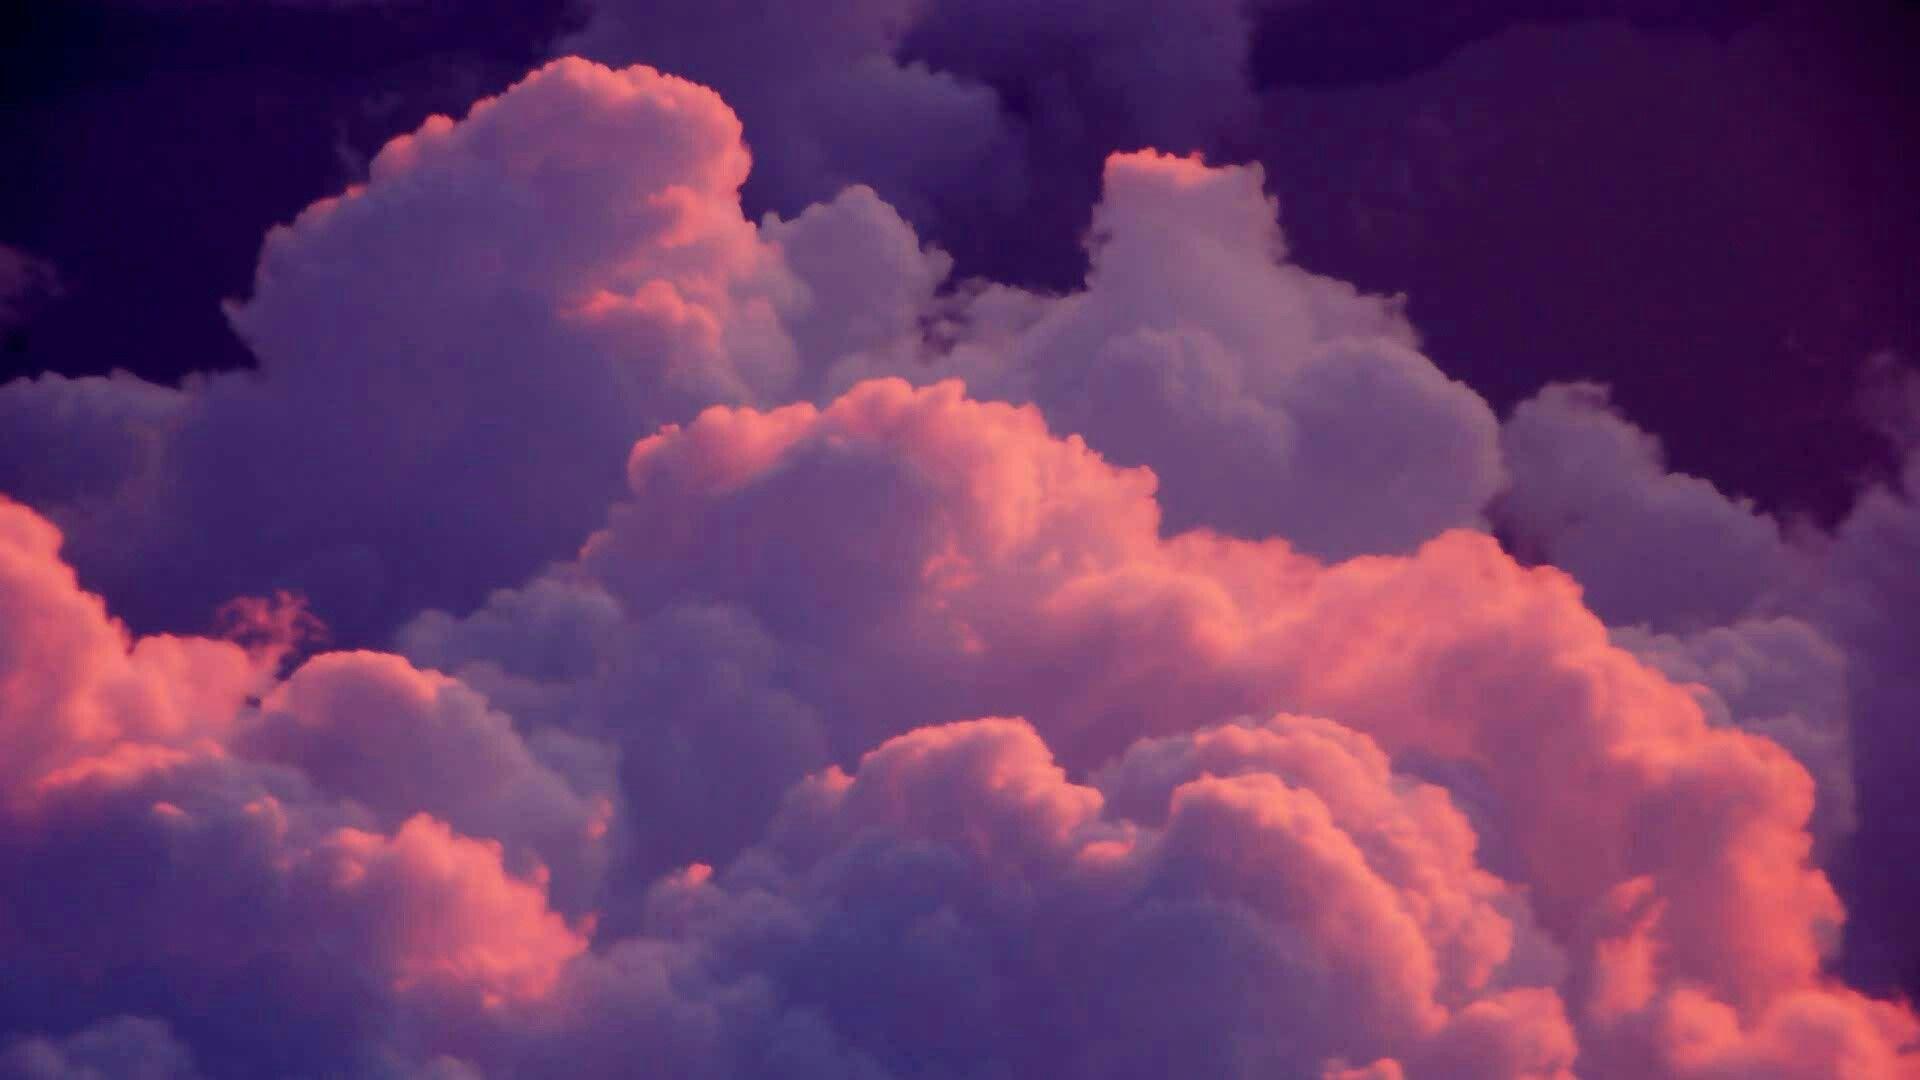 Pin By Laura Matthews On Clouds Pink Clouds Wallpaper Aesthetic Desktop Wallpaper Cloud Wallpaper